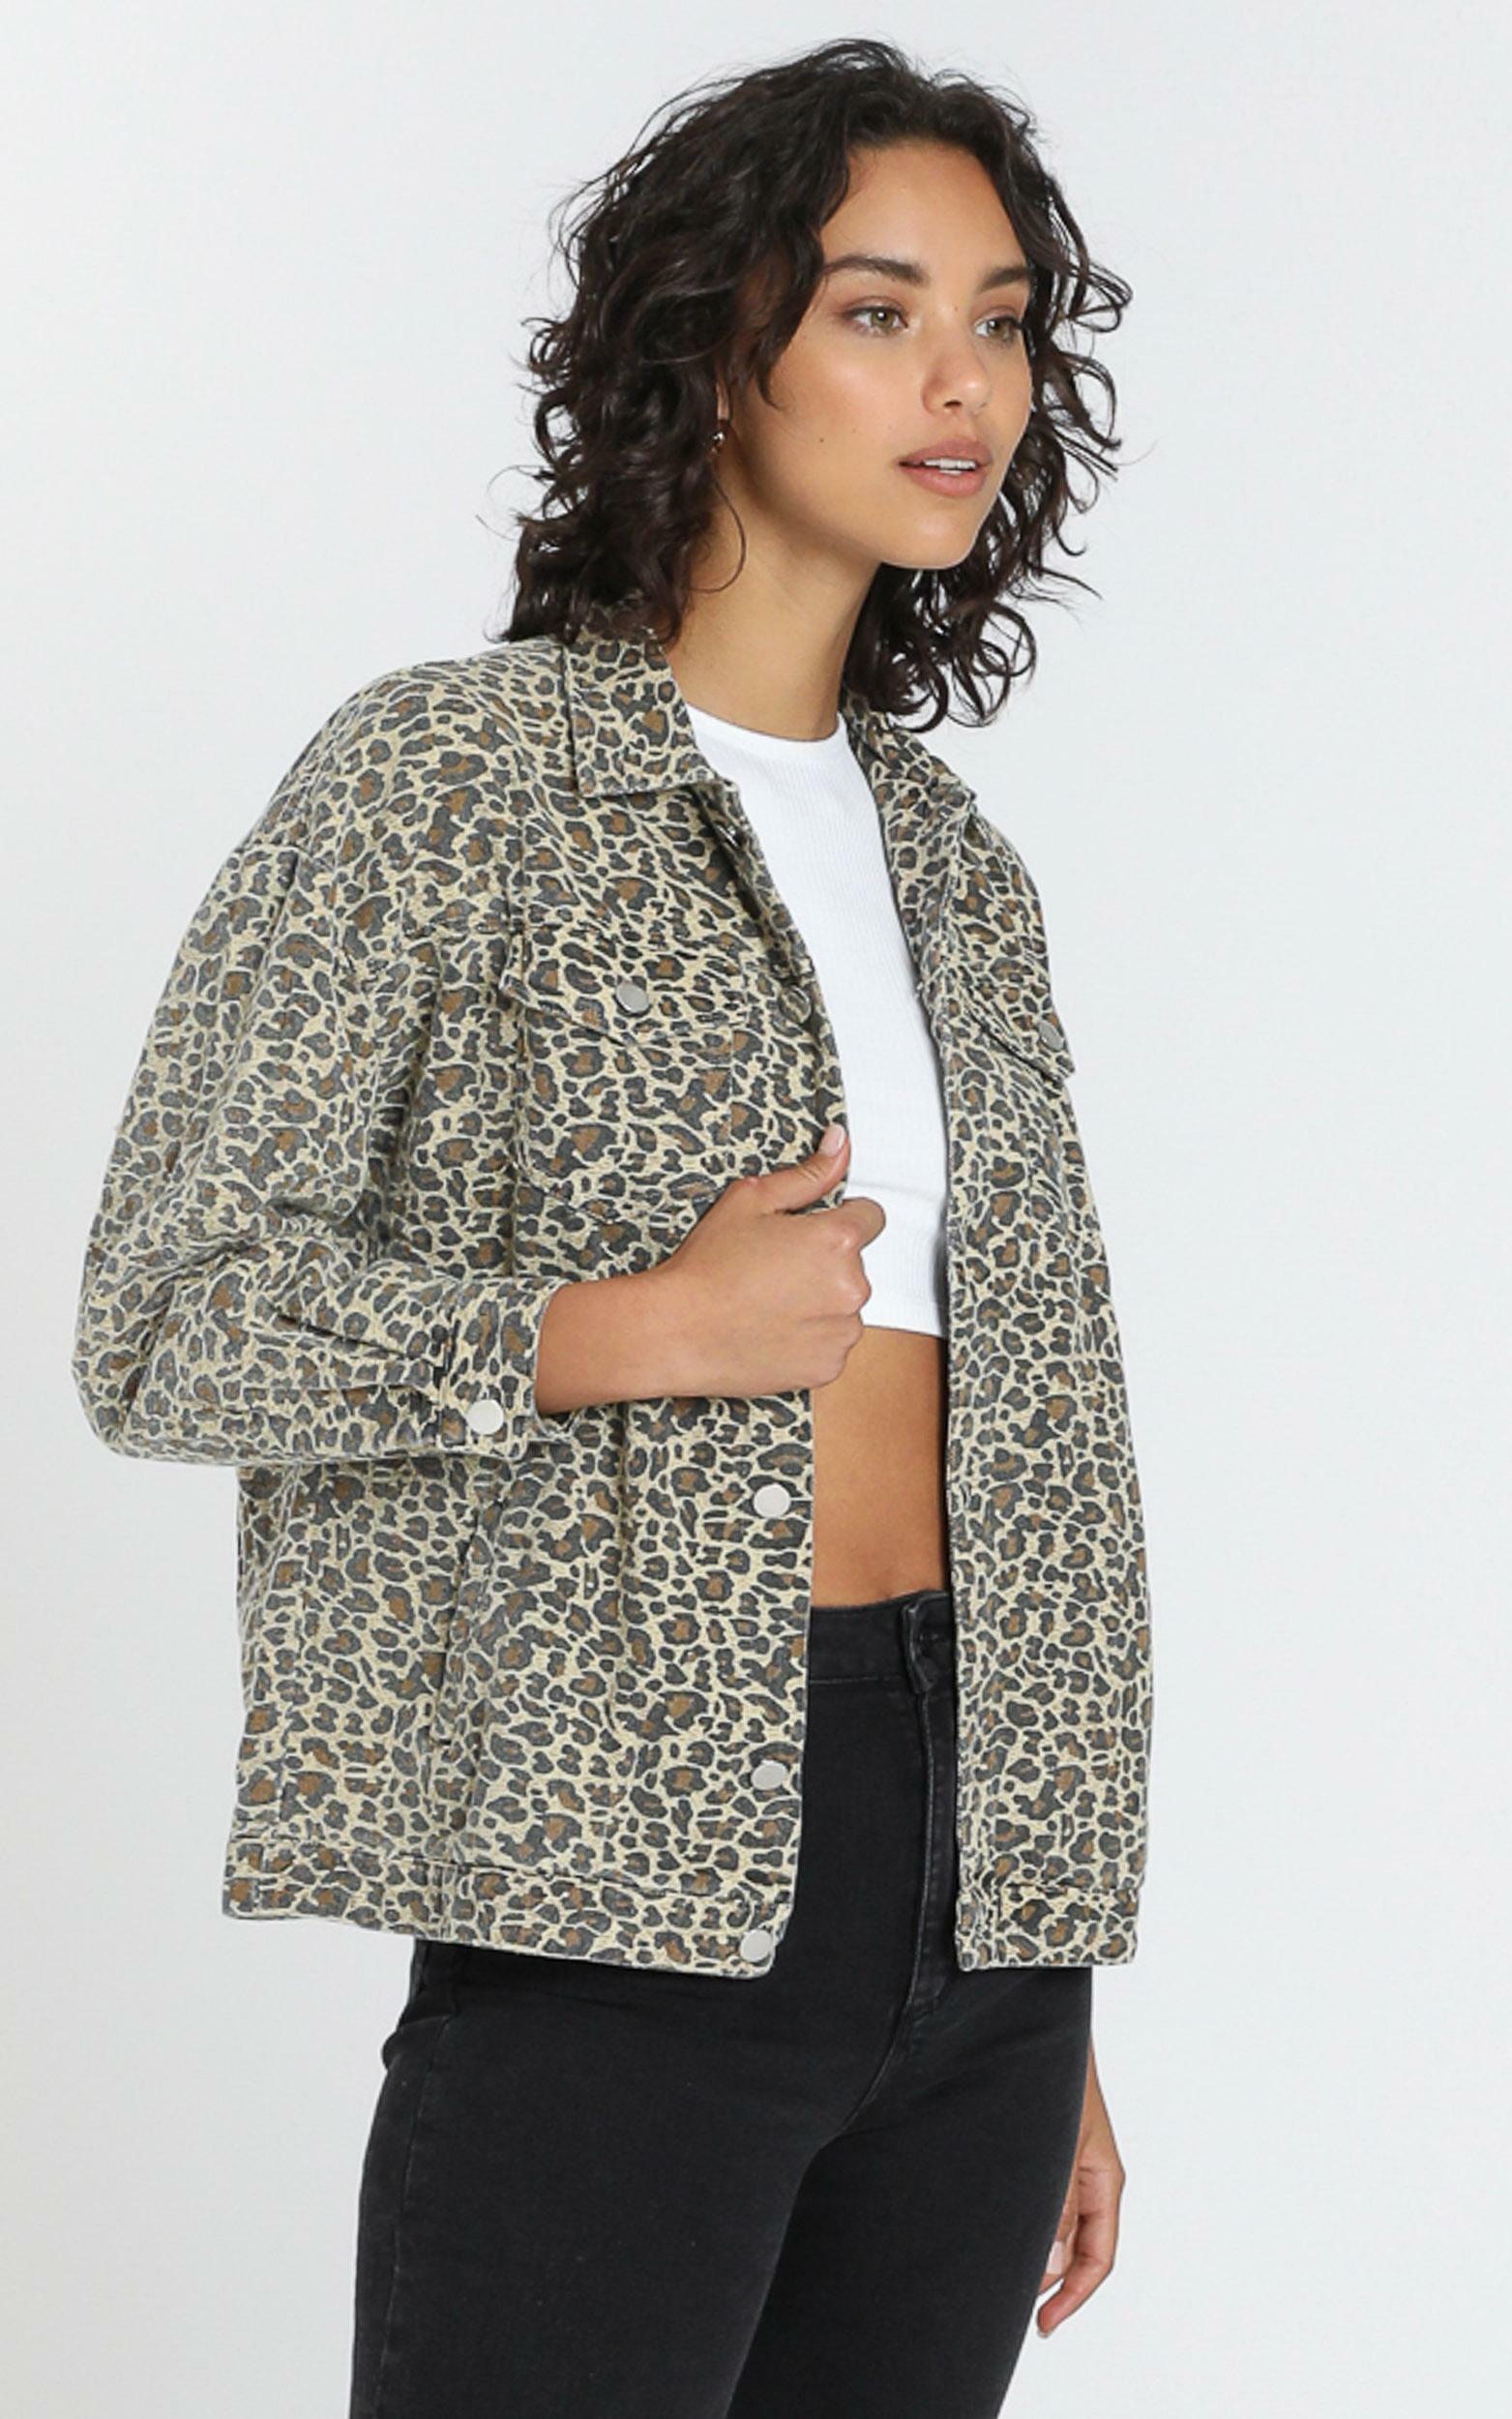 Fab Jacket in Leopard - 8 (S), Beige, hi-res image number null